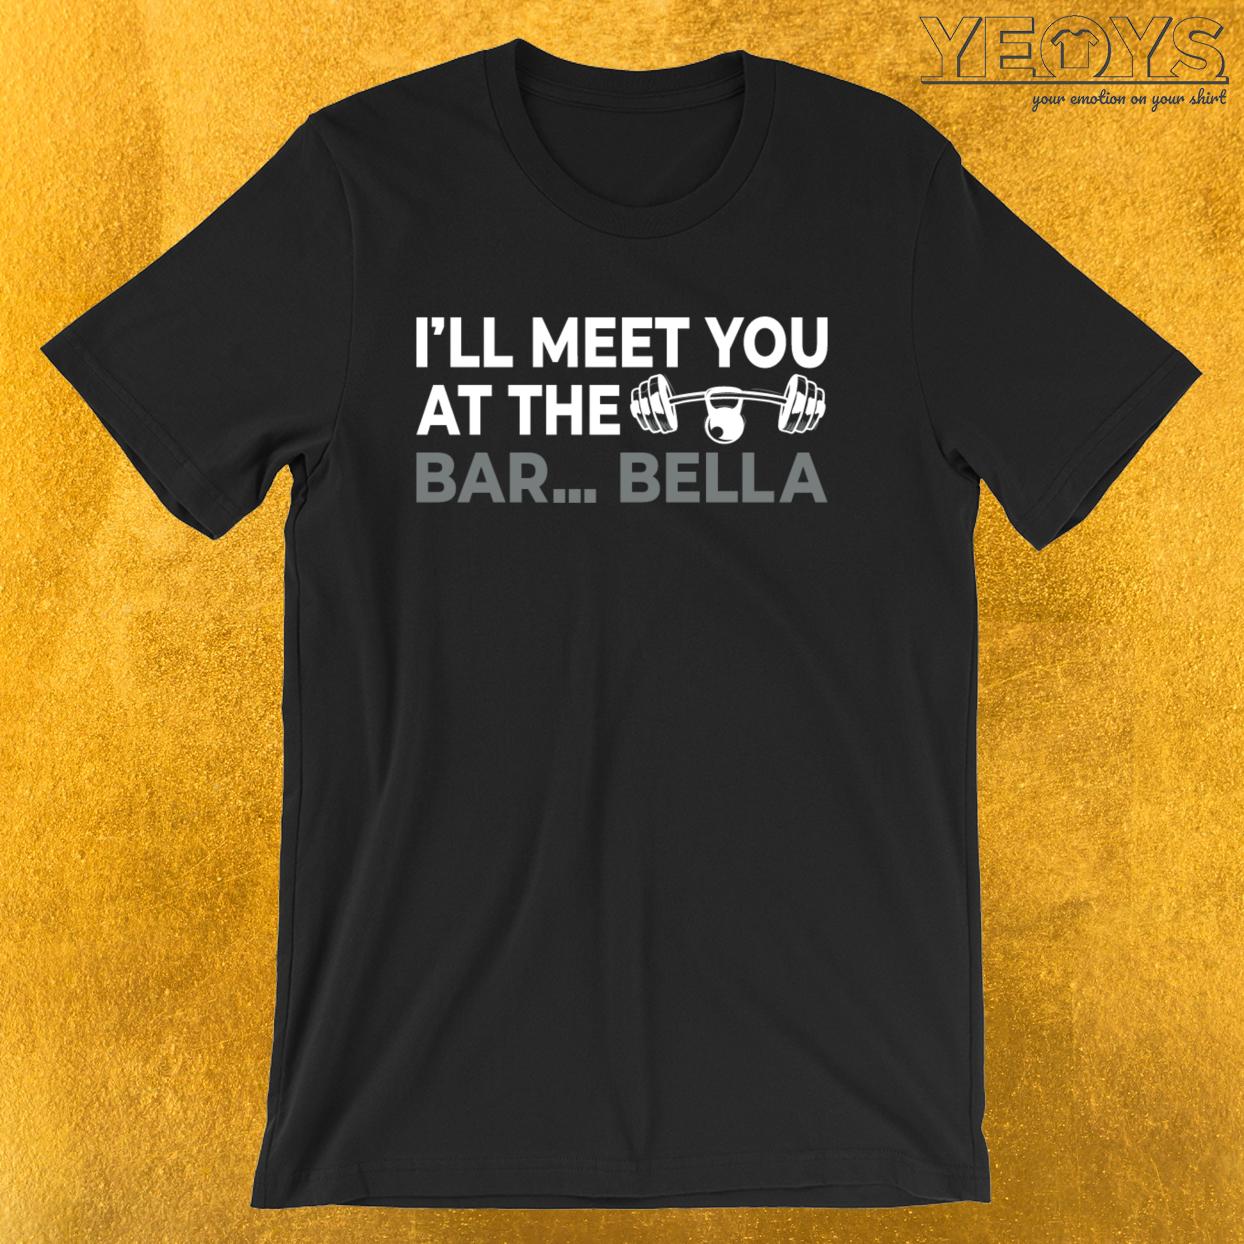 I'll Meet You At The Bar…Bella – Barbell Tee